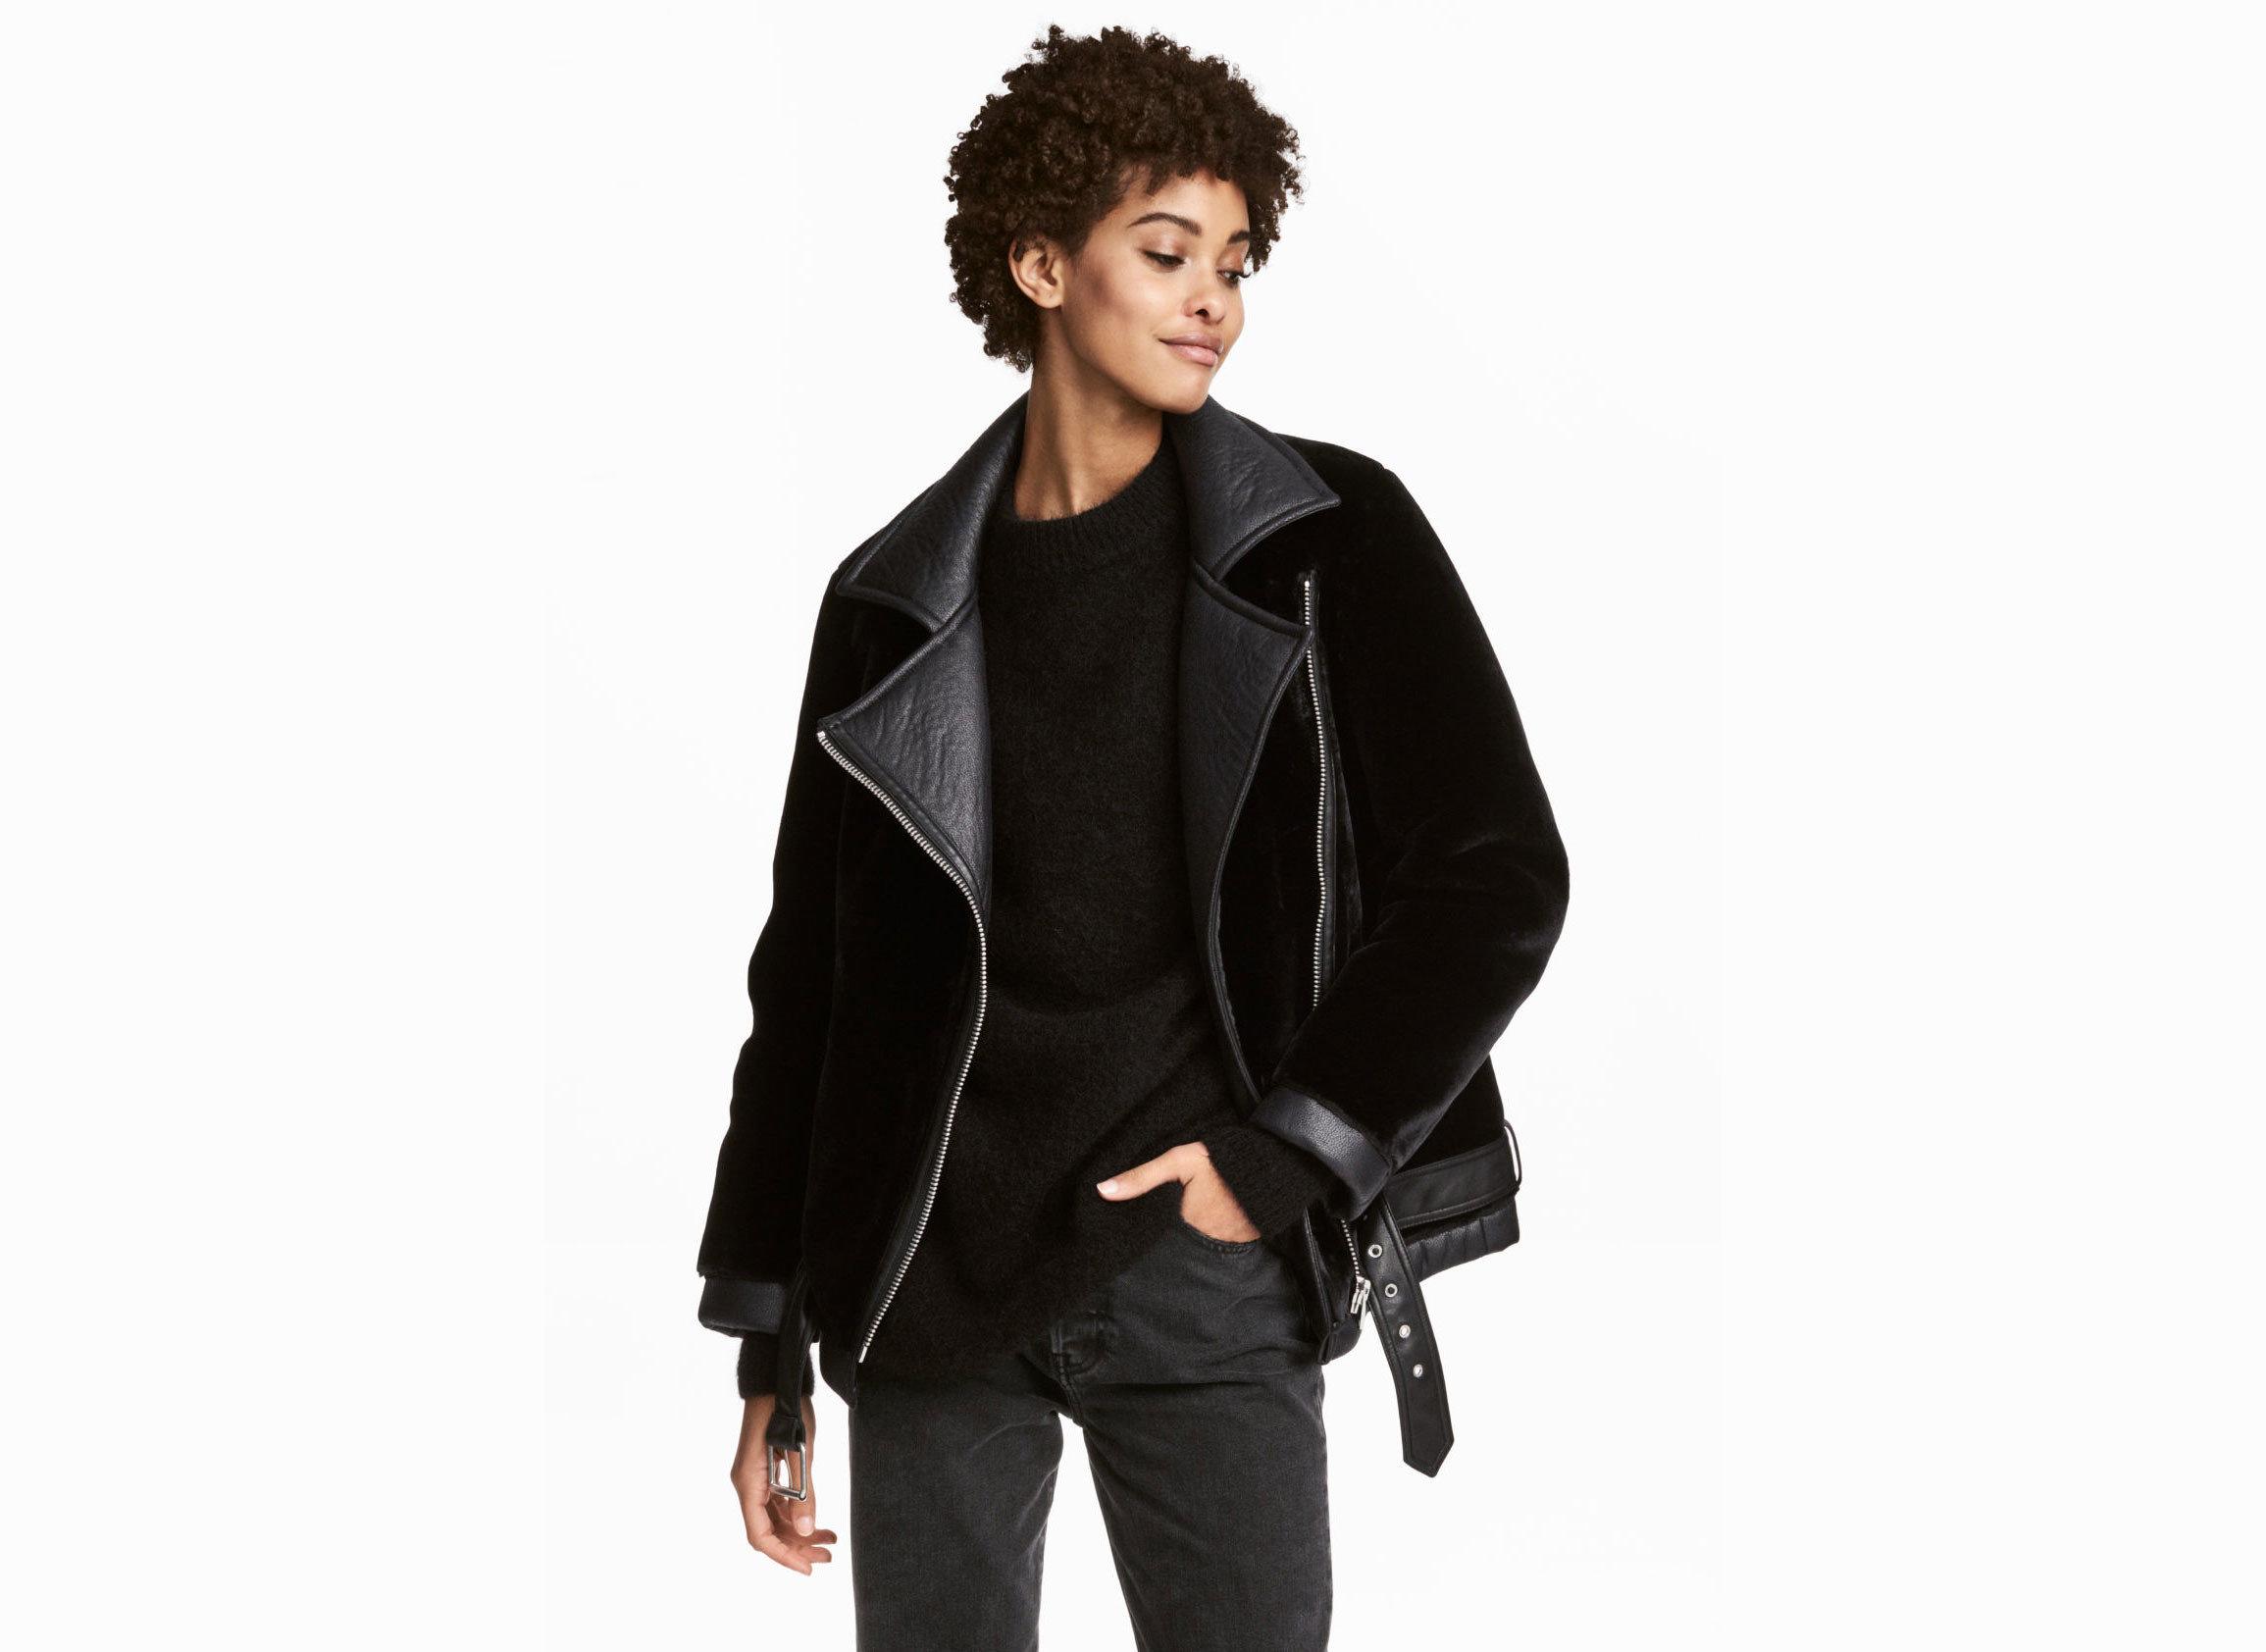 Style + Design Travel Shop person jacket standing fashion model shoulder fashion leather jacket posing leather product zipper coat fur overcoat